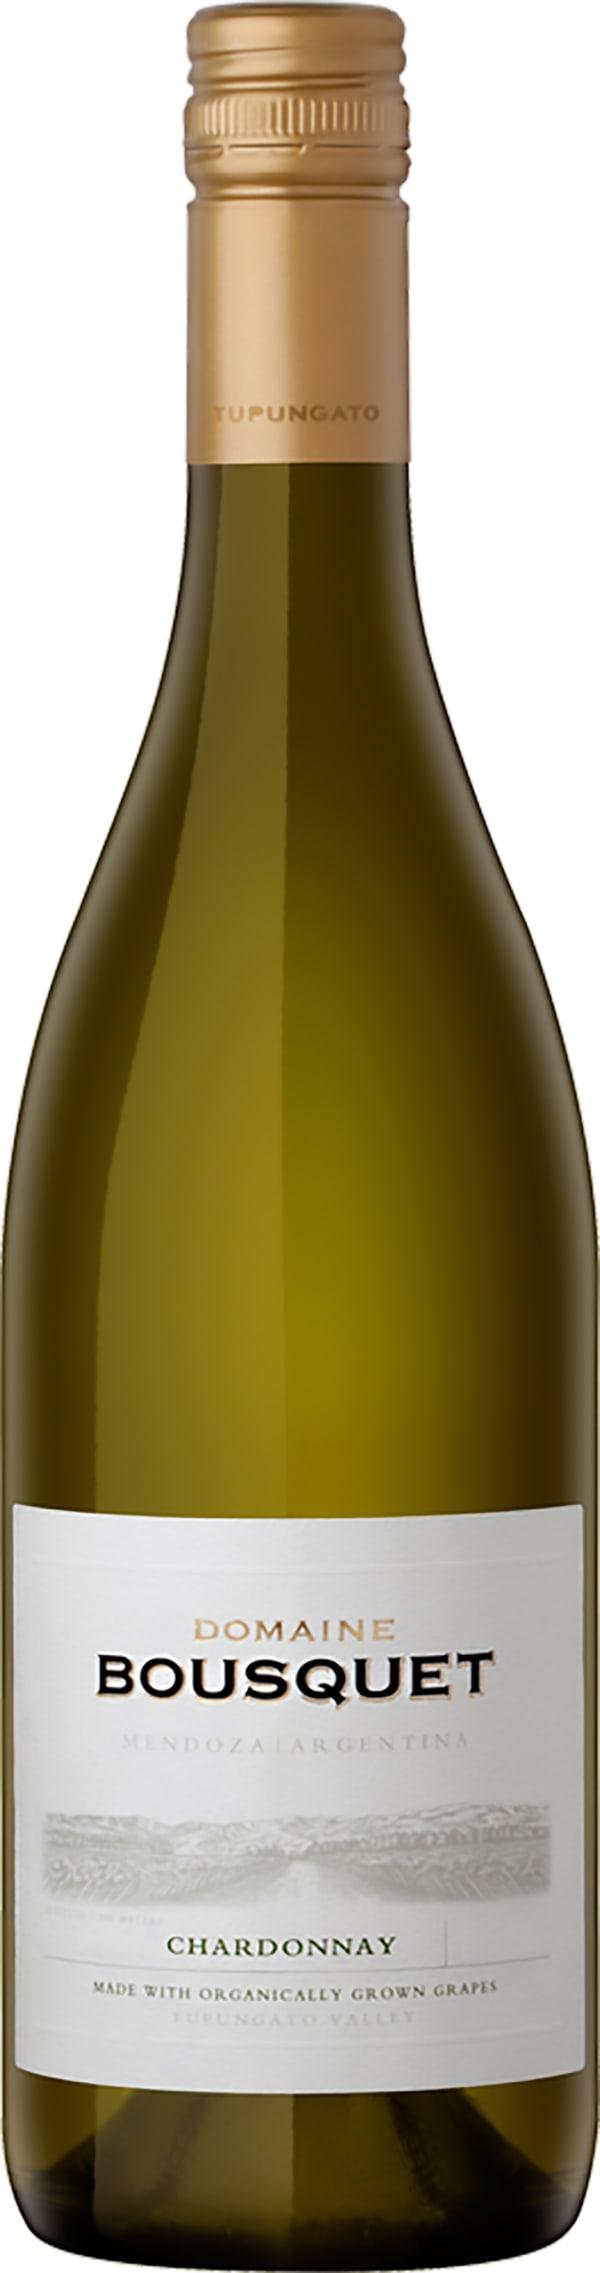 Domaine Bousquet Chardonnay Organic 2016